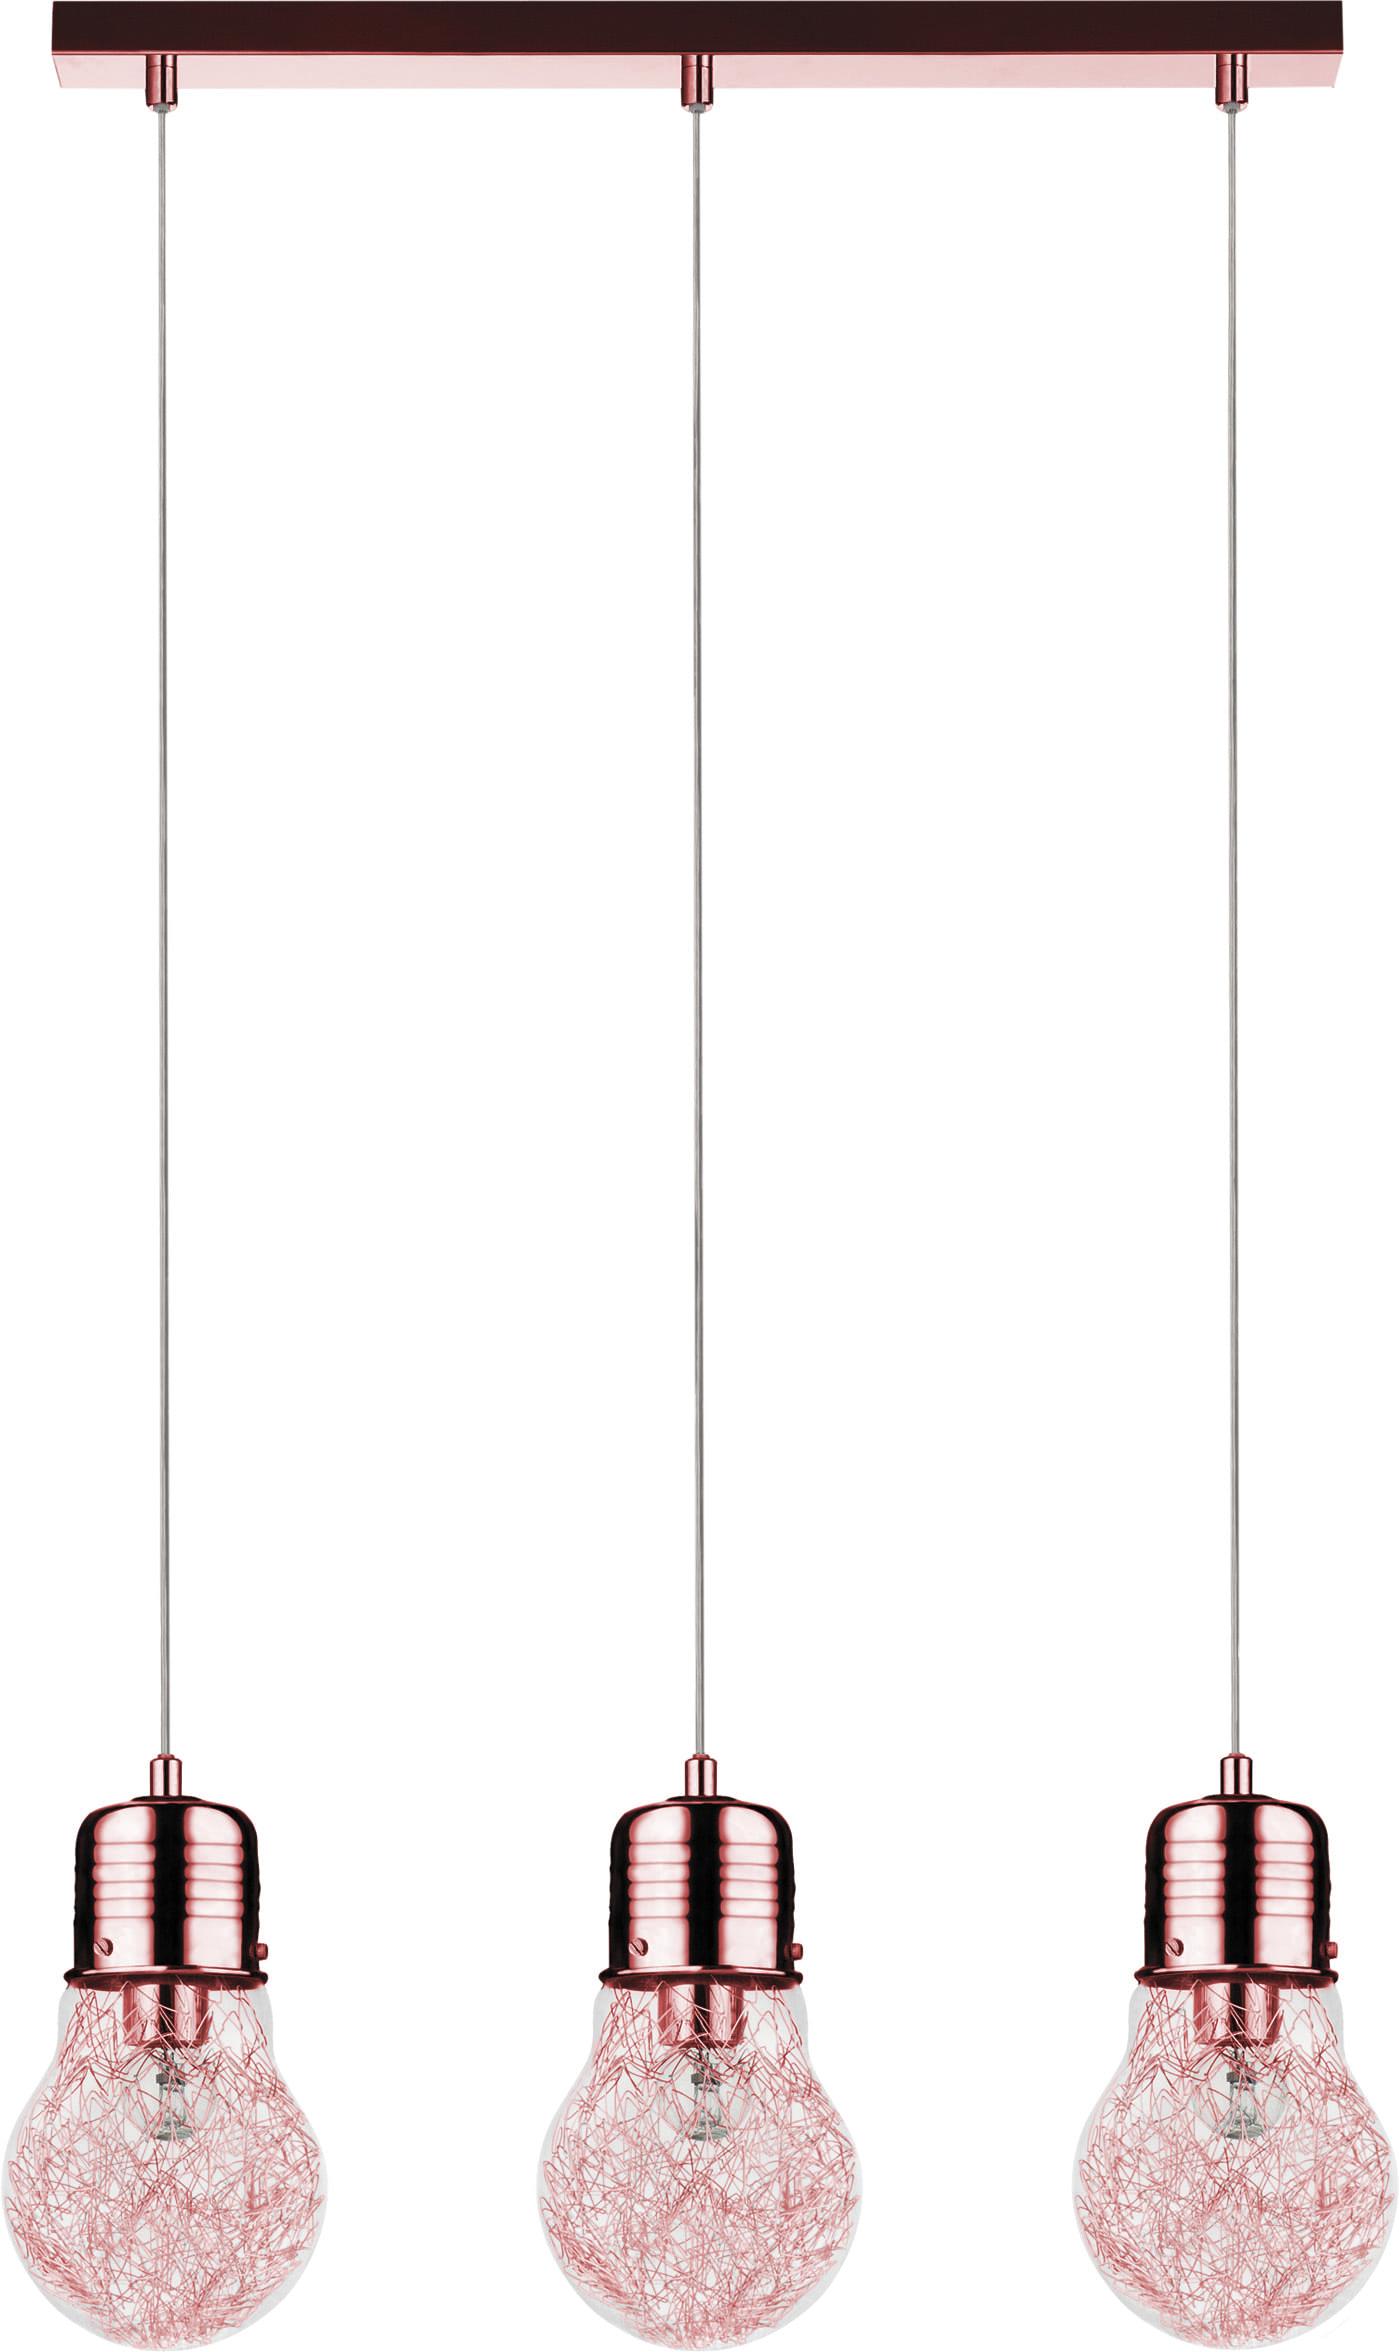 Kanon Hanging lamp Triple Bulb copper E27 60W | Lighting Shop Lunares OJ-93